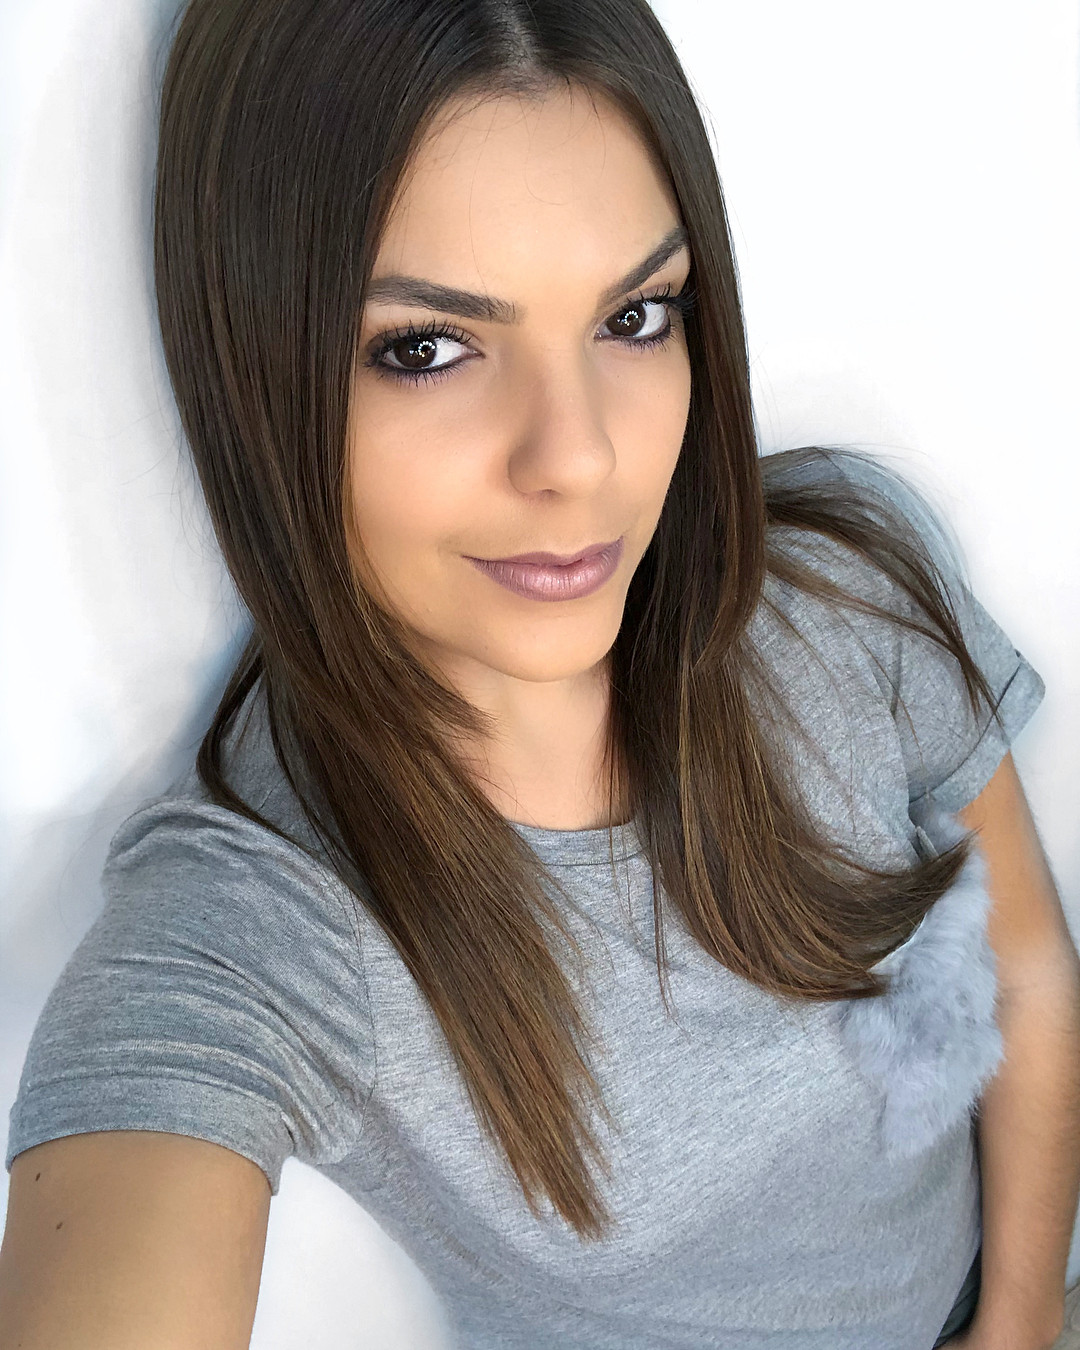 jessica poeta lirio, miss friendship brazil 2021/top 10 de miss tourism queen international 2015. - Página 10 Bzl87i10